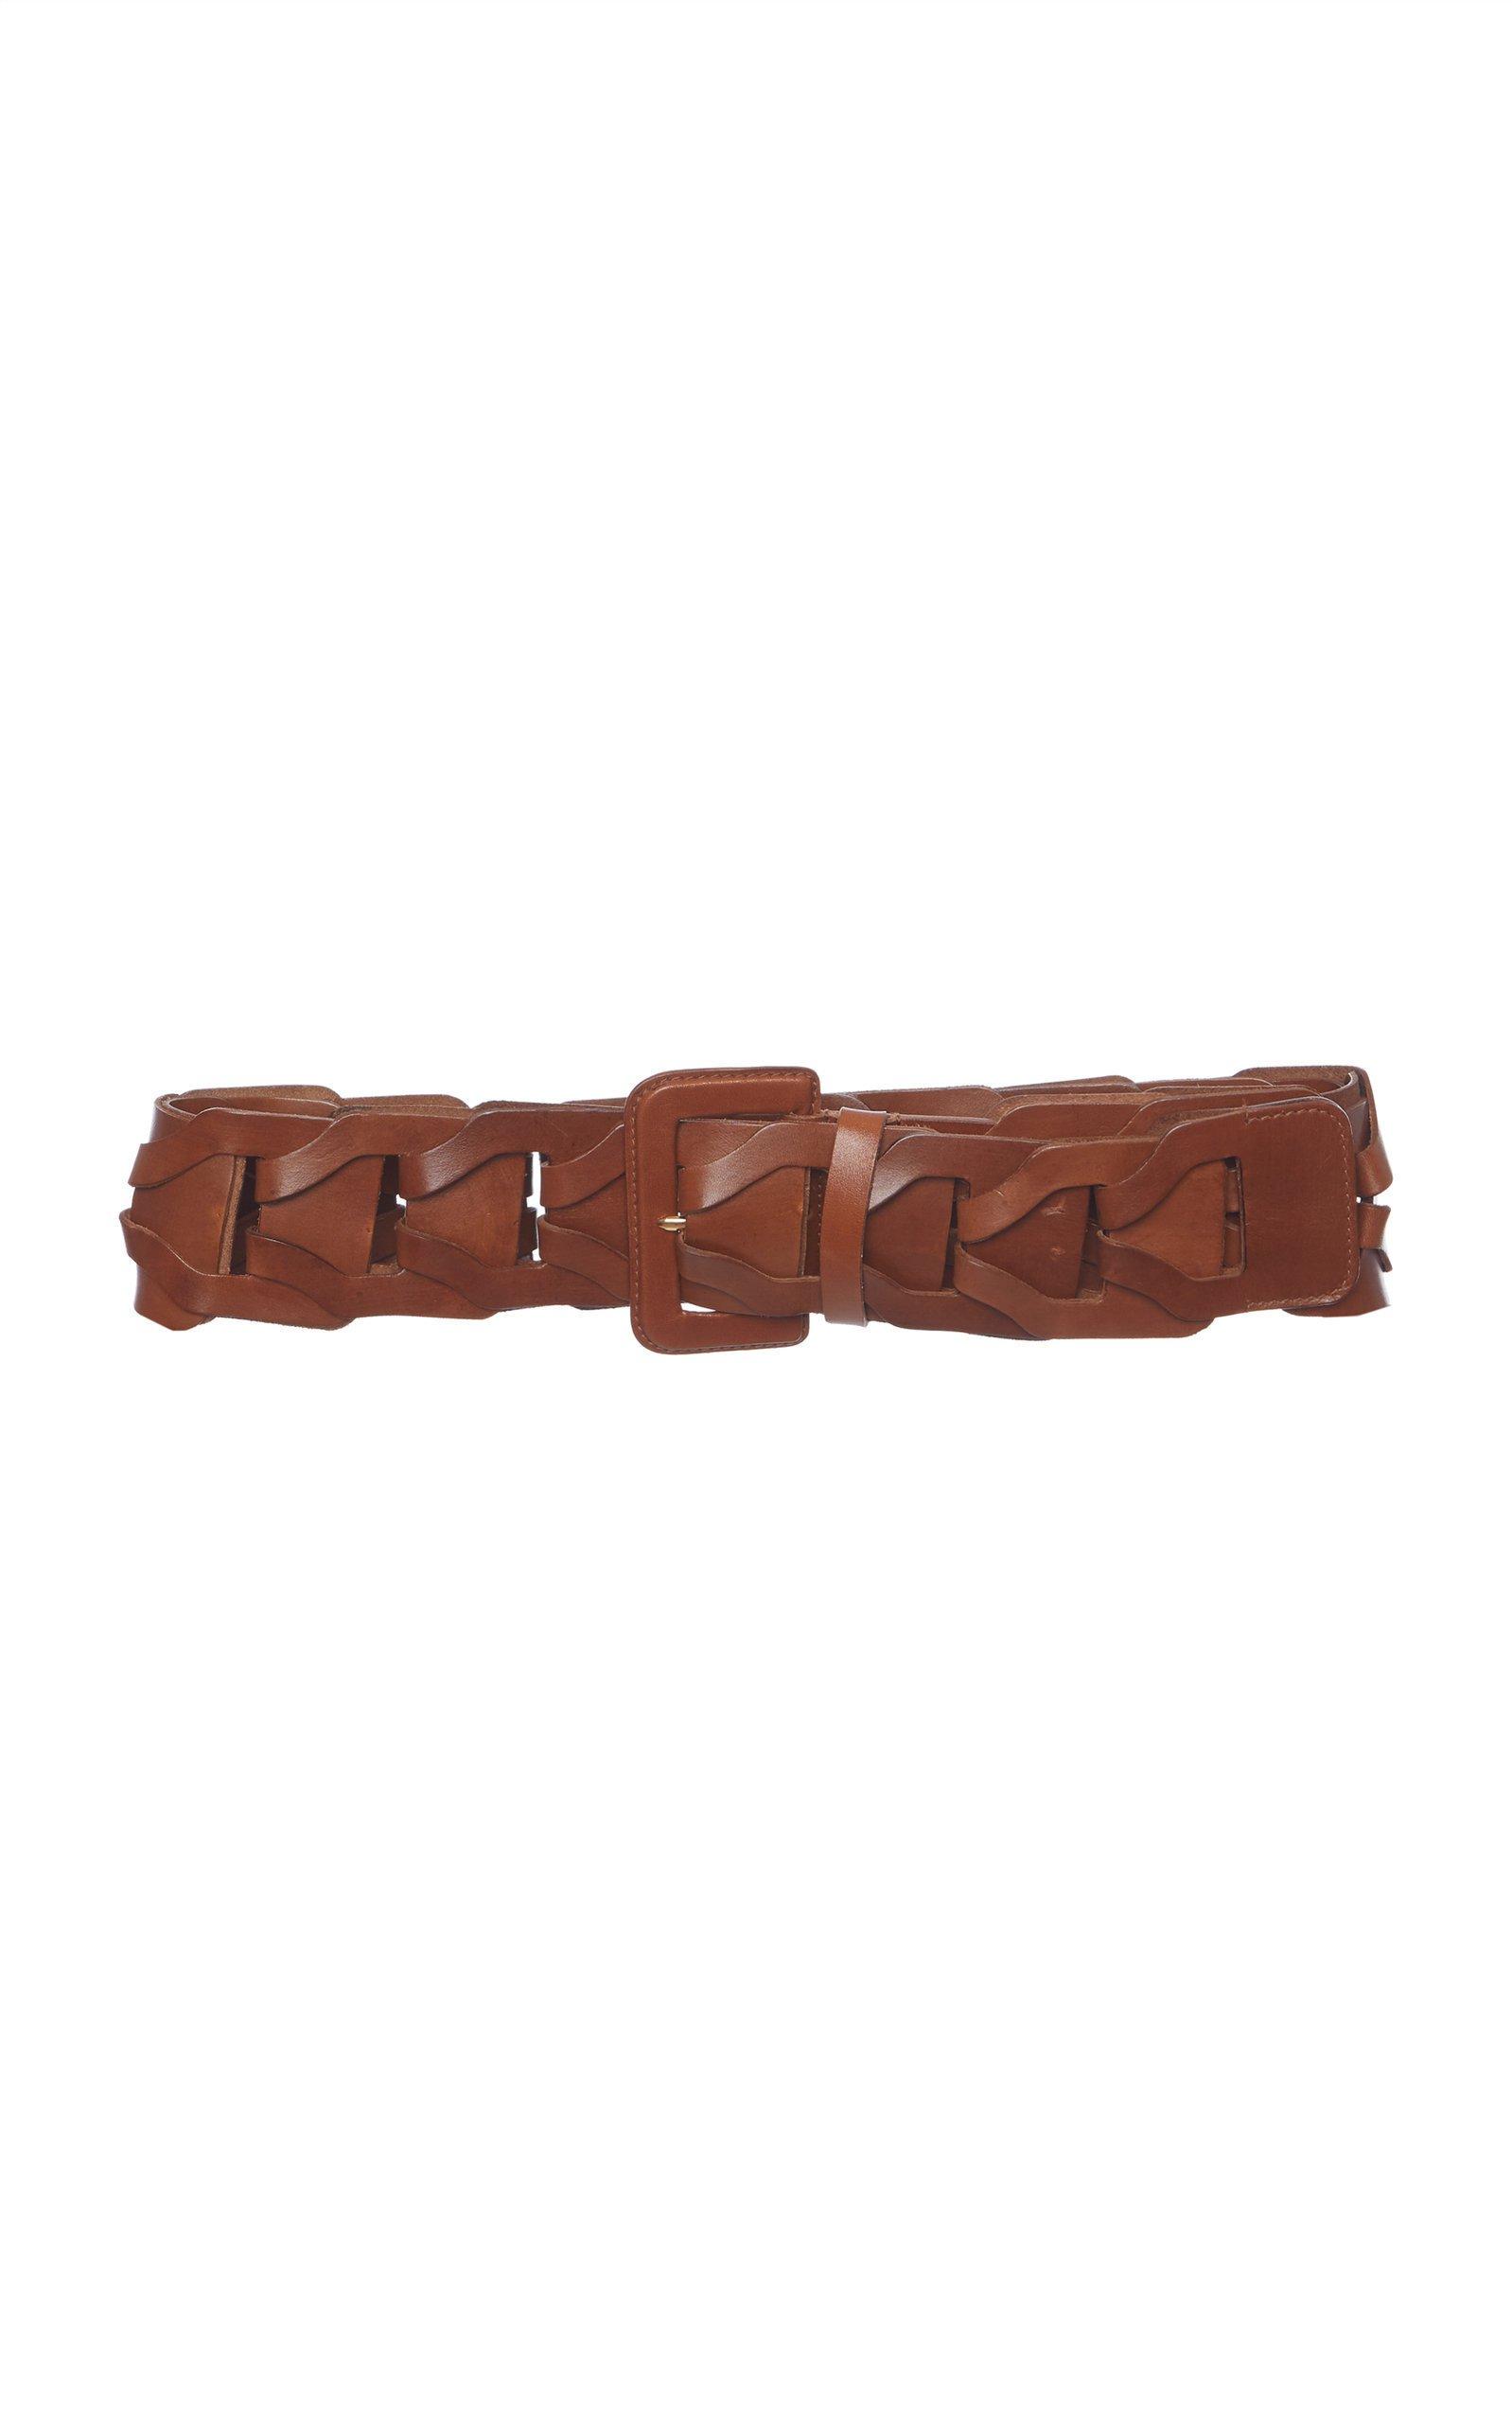 Prada Wide Woven Leather Belt Size: 65 cm